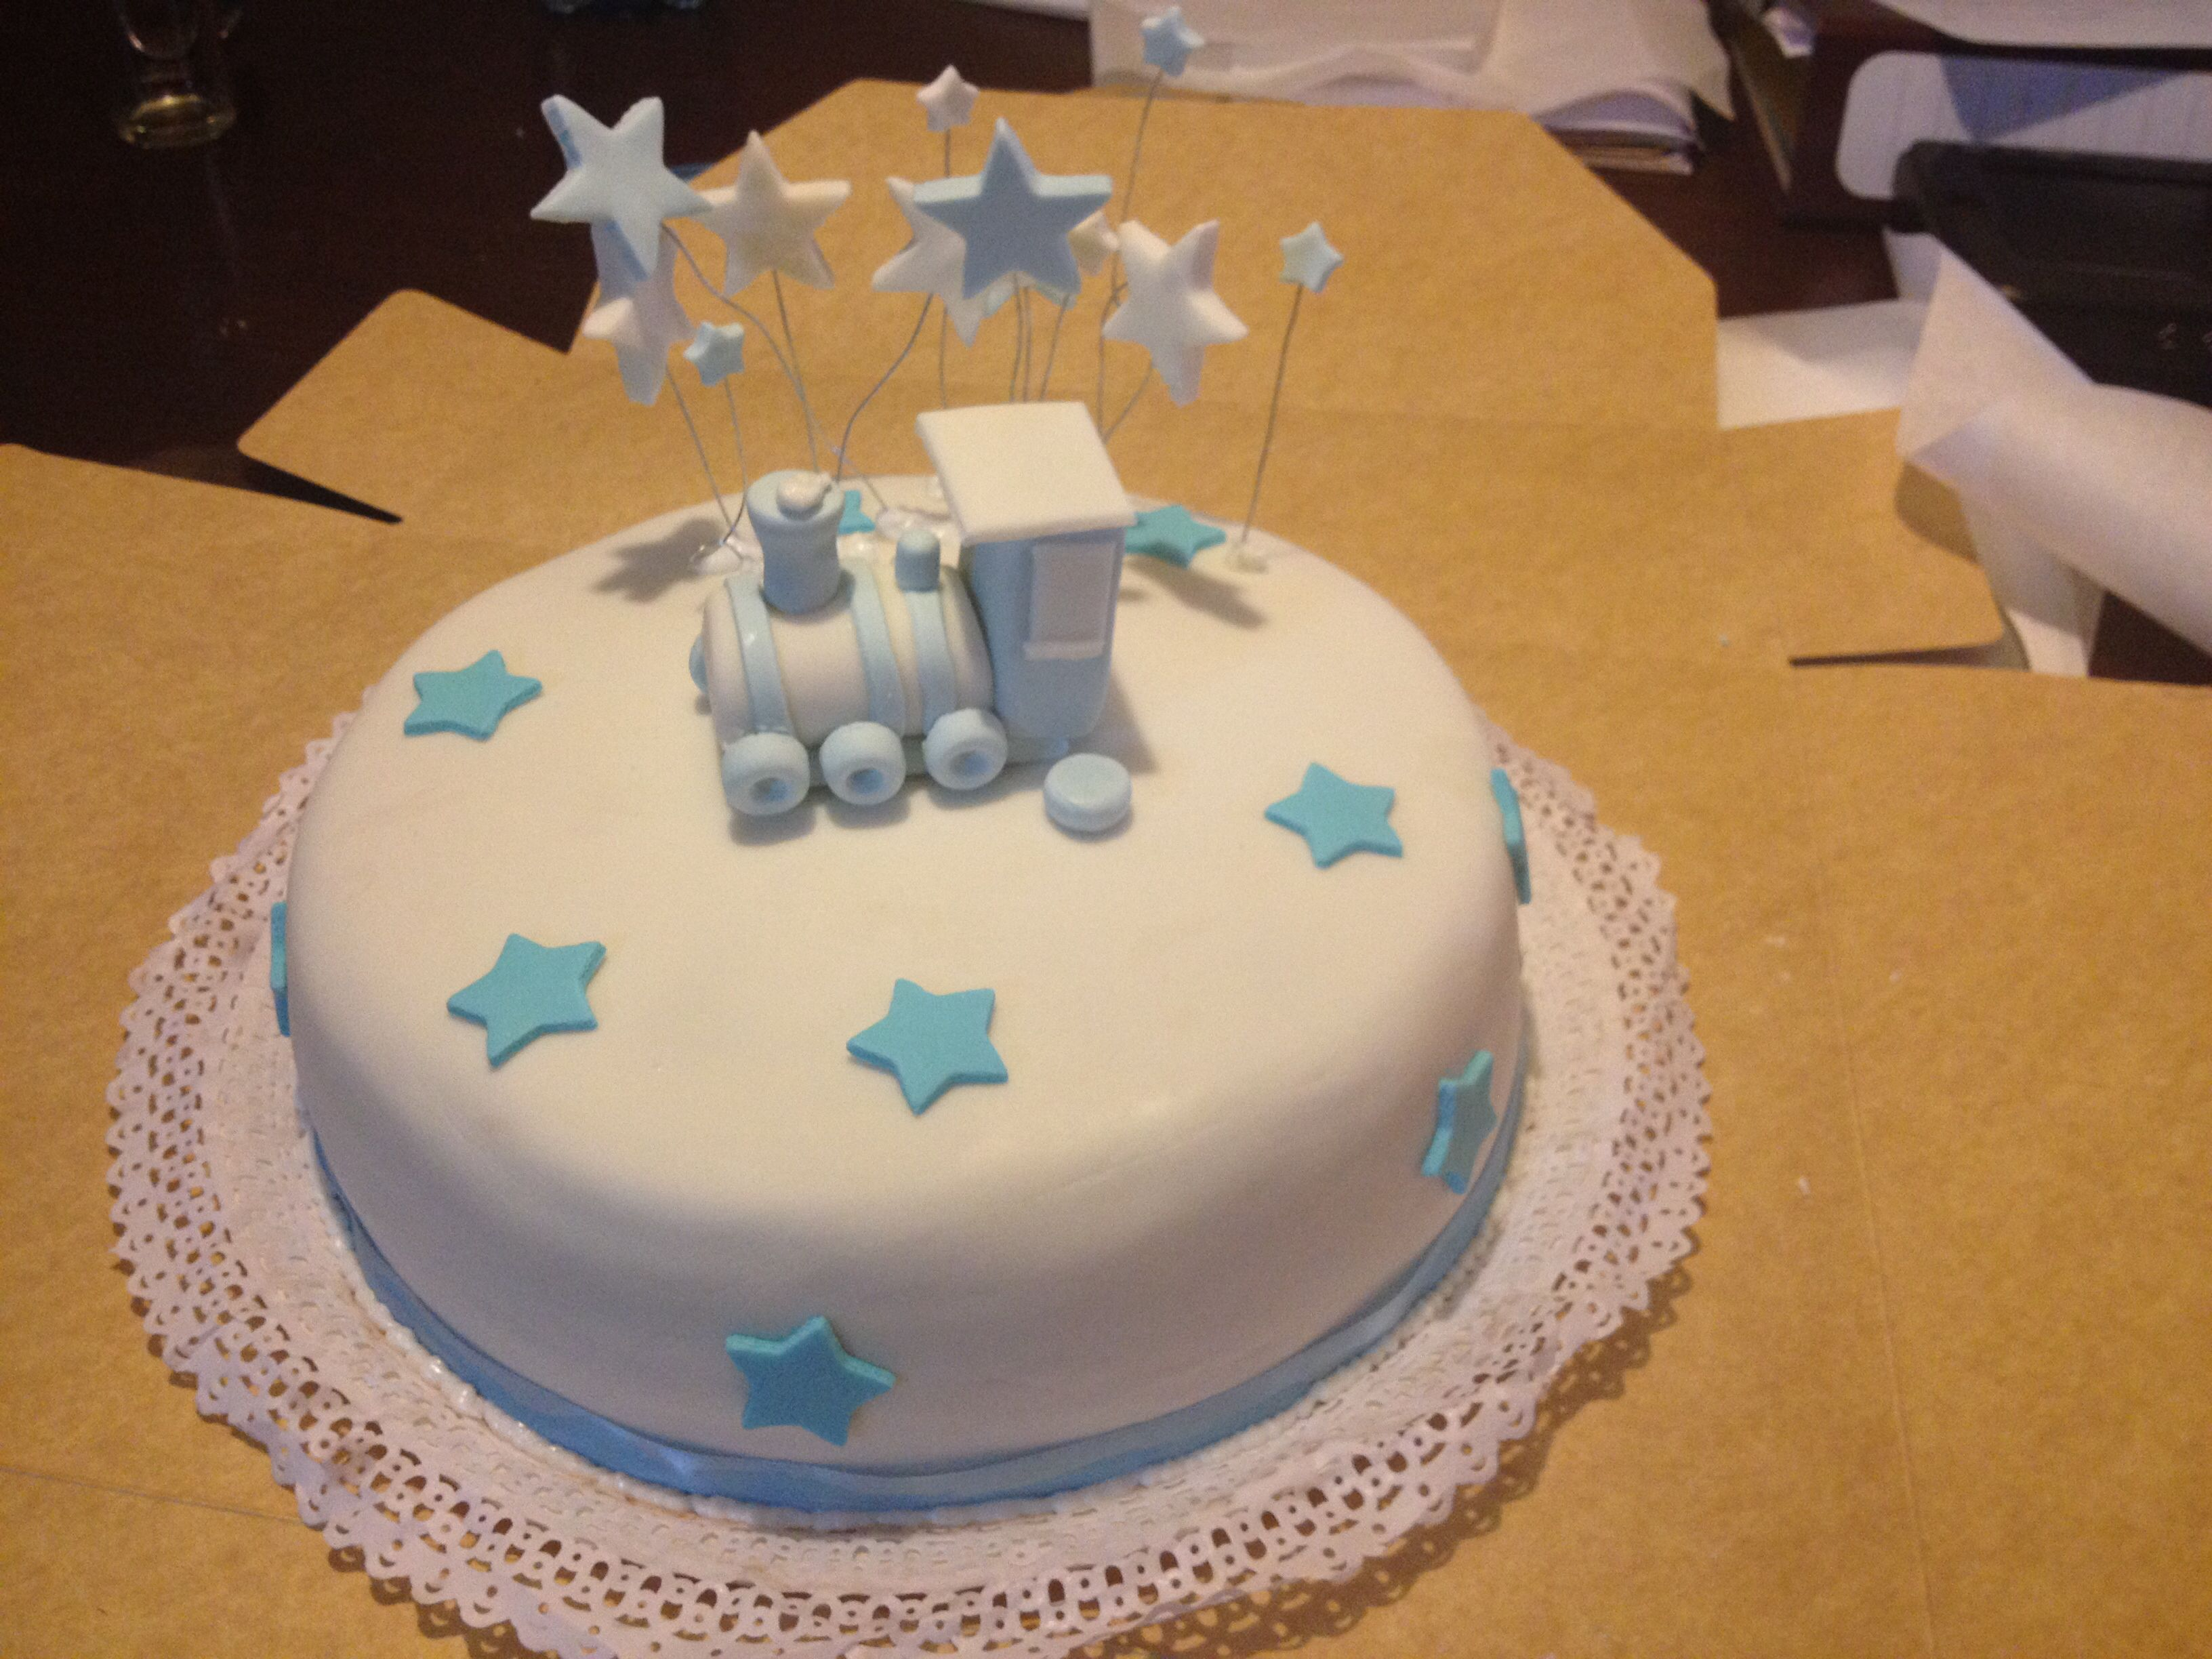 Torta bautizo | decoracion | Pinterest | Torta bautizo, Bautizo y ...